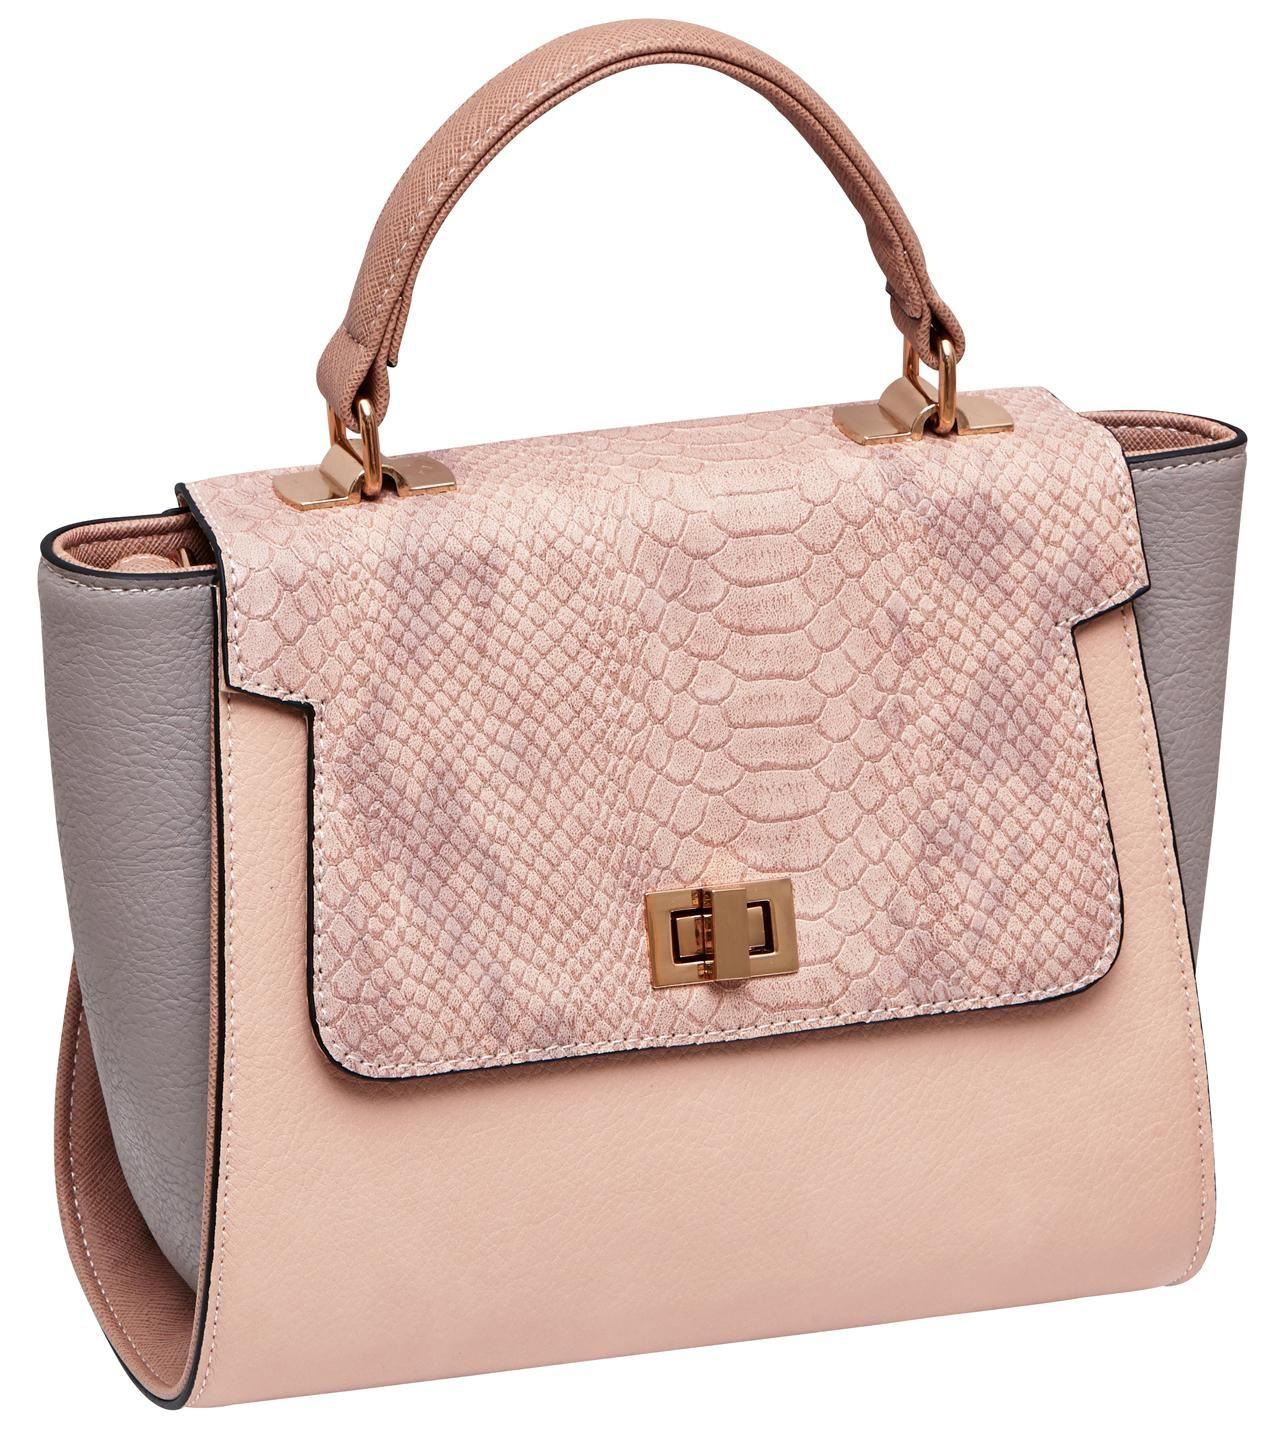 Tasche Rose Girl Bijou Brigitte Online Shop | Bags